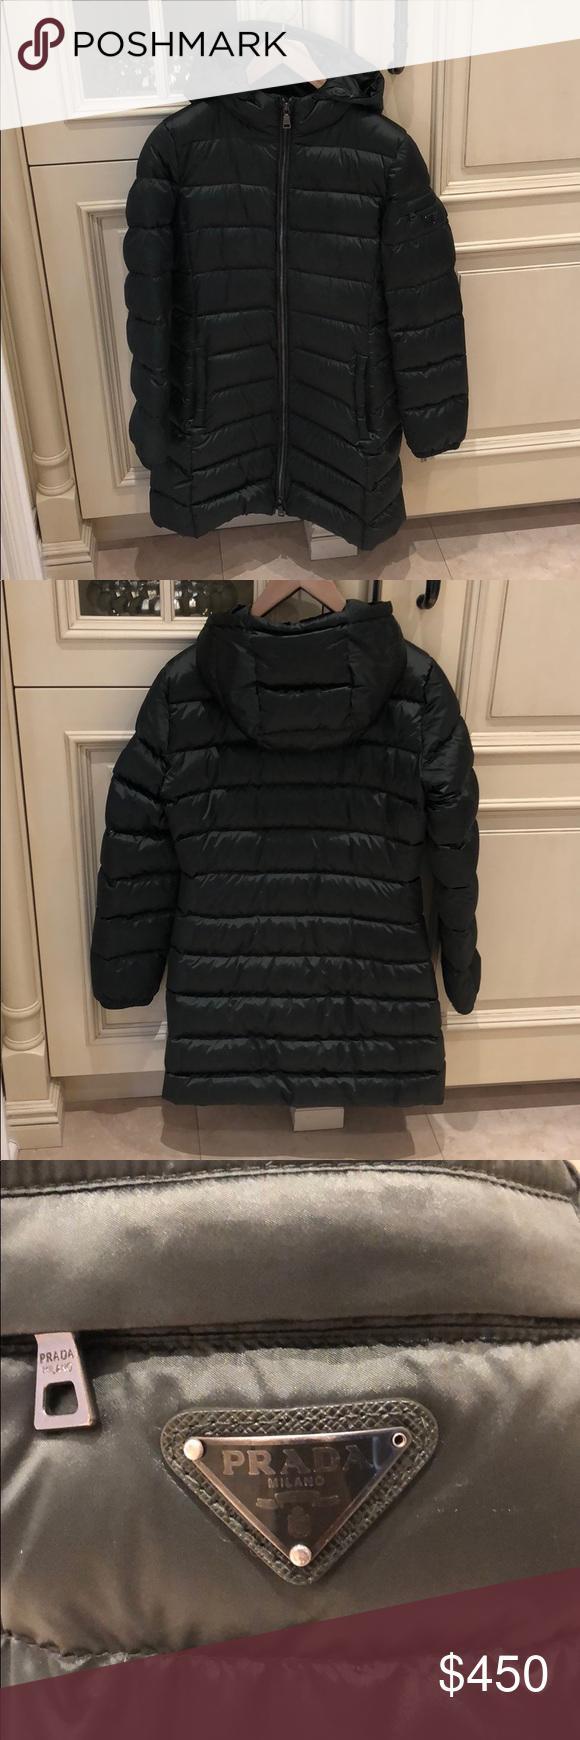 Prada Women S Jacket Clothes Design Jackets Fashion Design [ 1740 x 580 Pixel ]